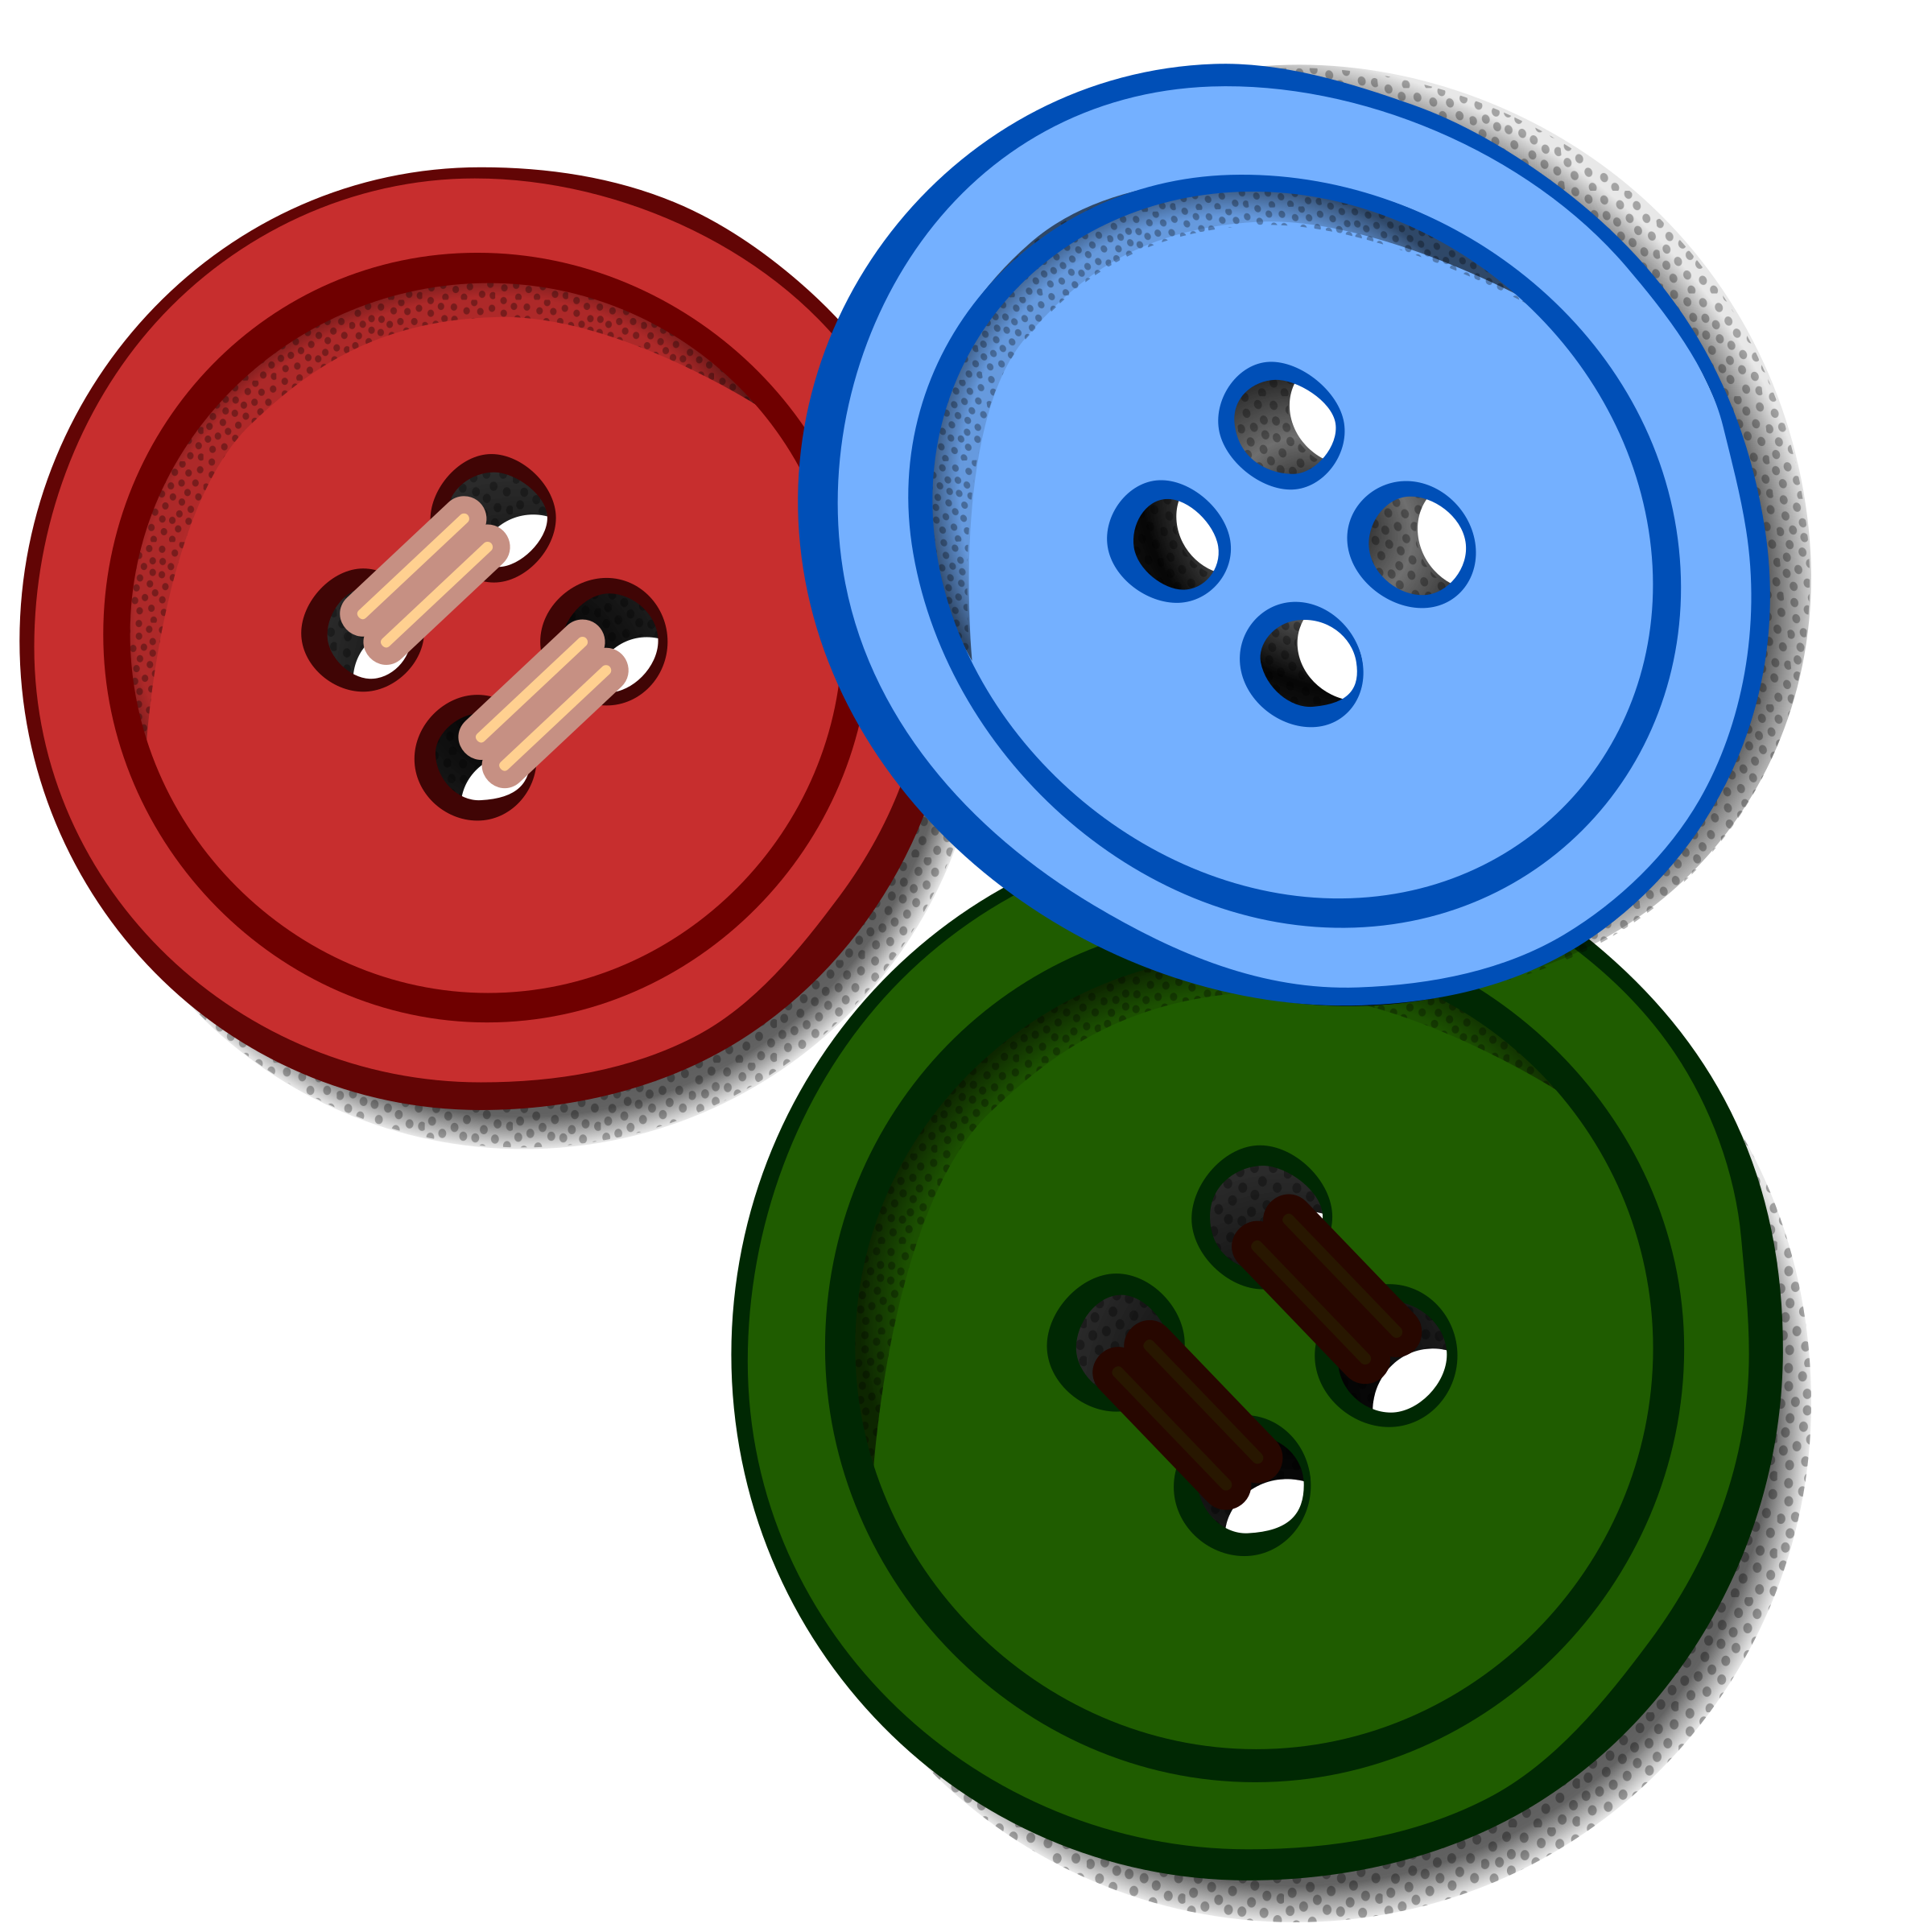 Buttons coloured big image. Button clipart